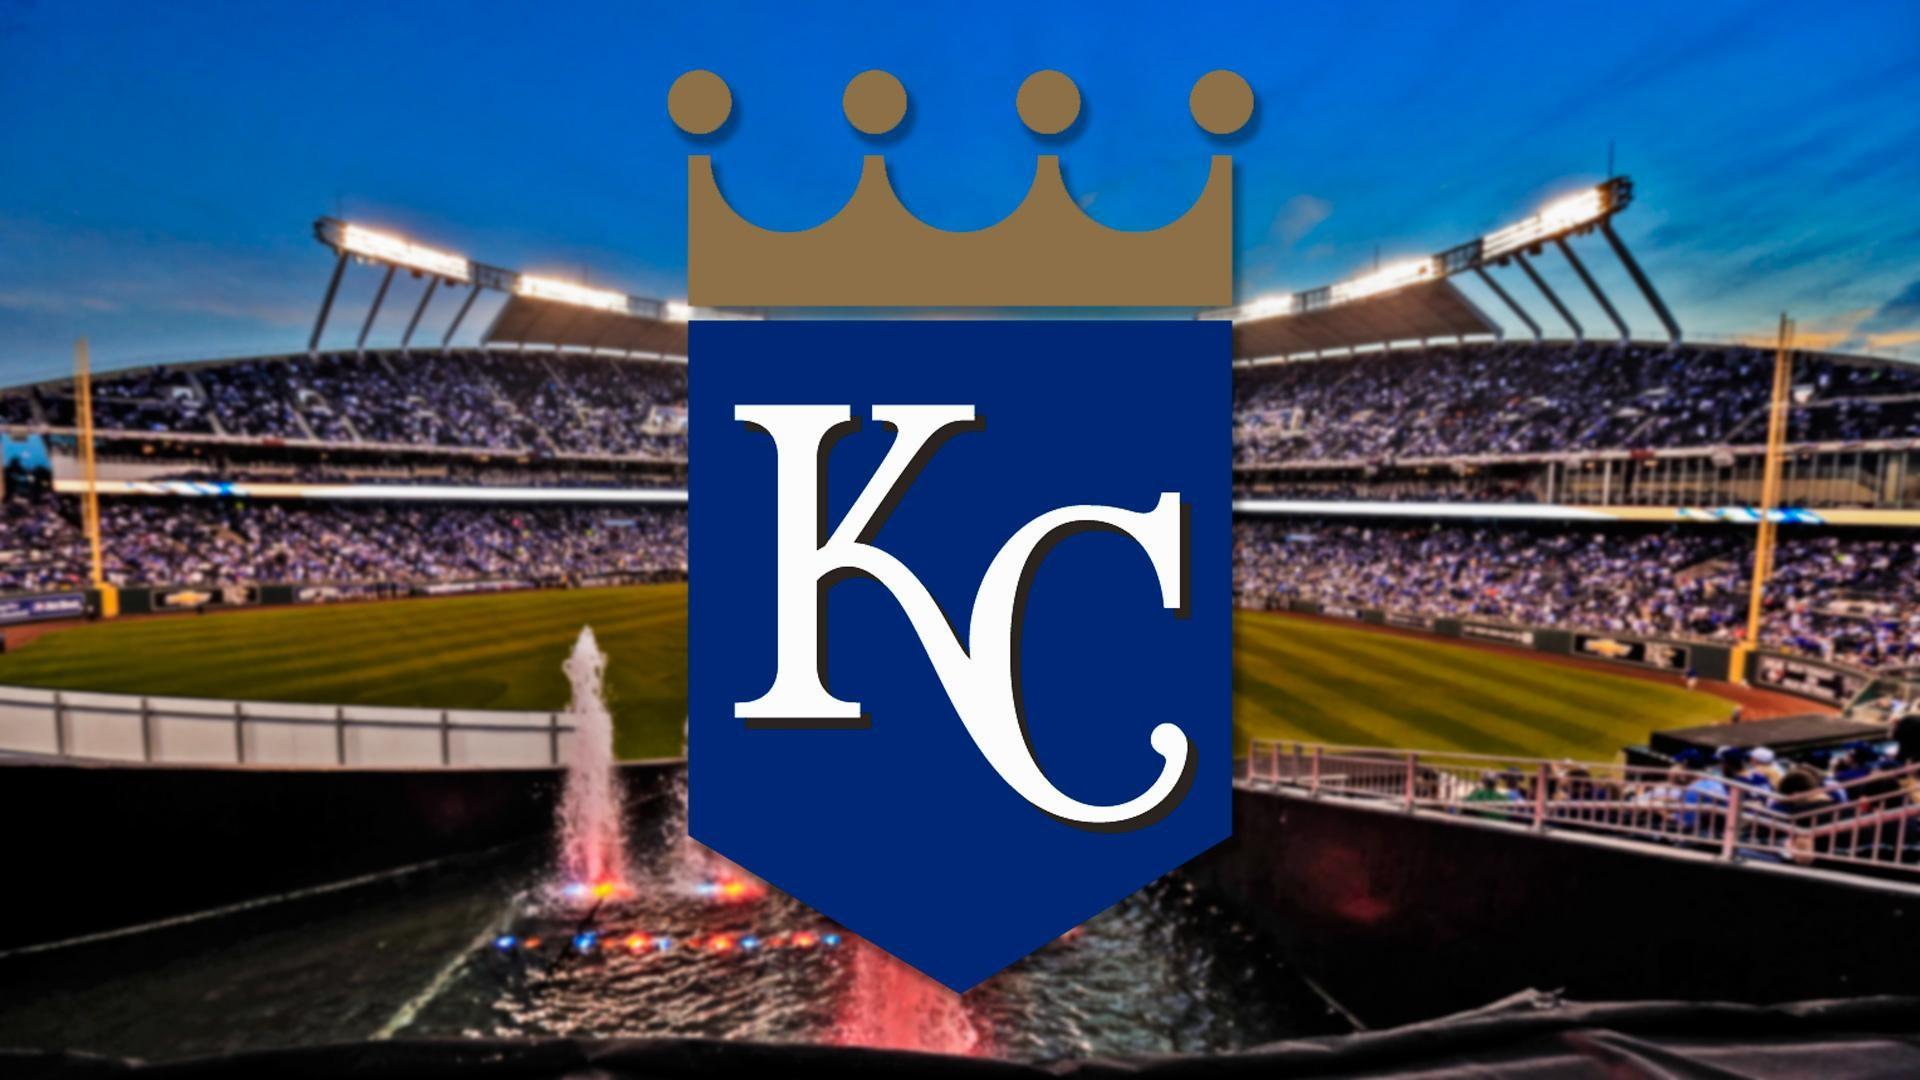 wallpaper.wiki-Art-Images-HD-Kansas-City-Royals-